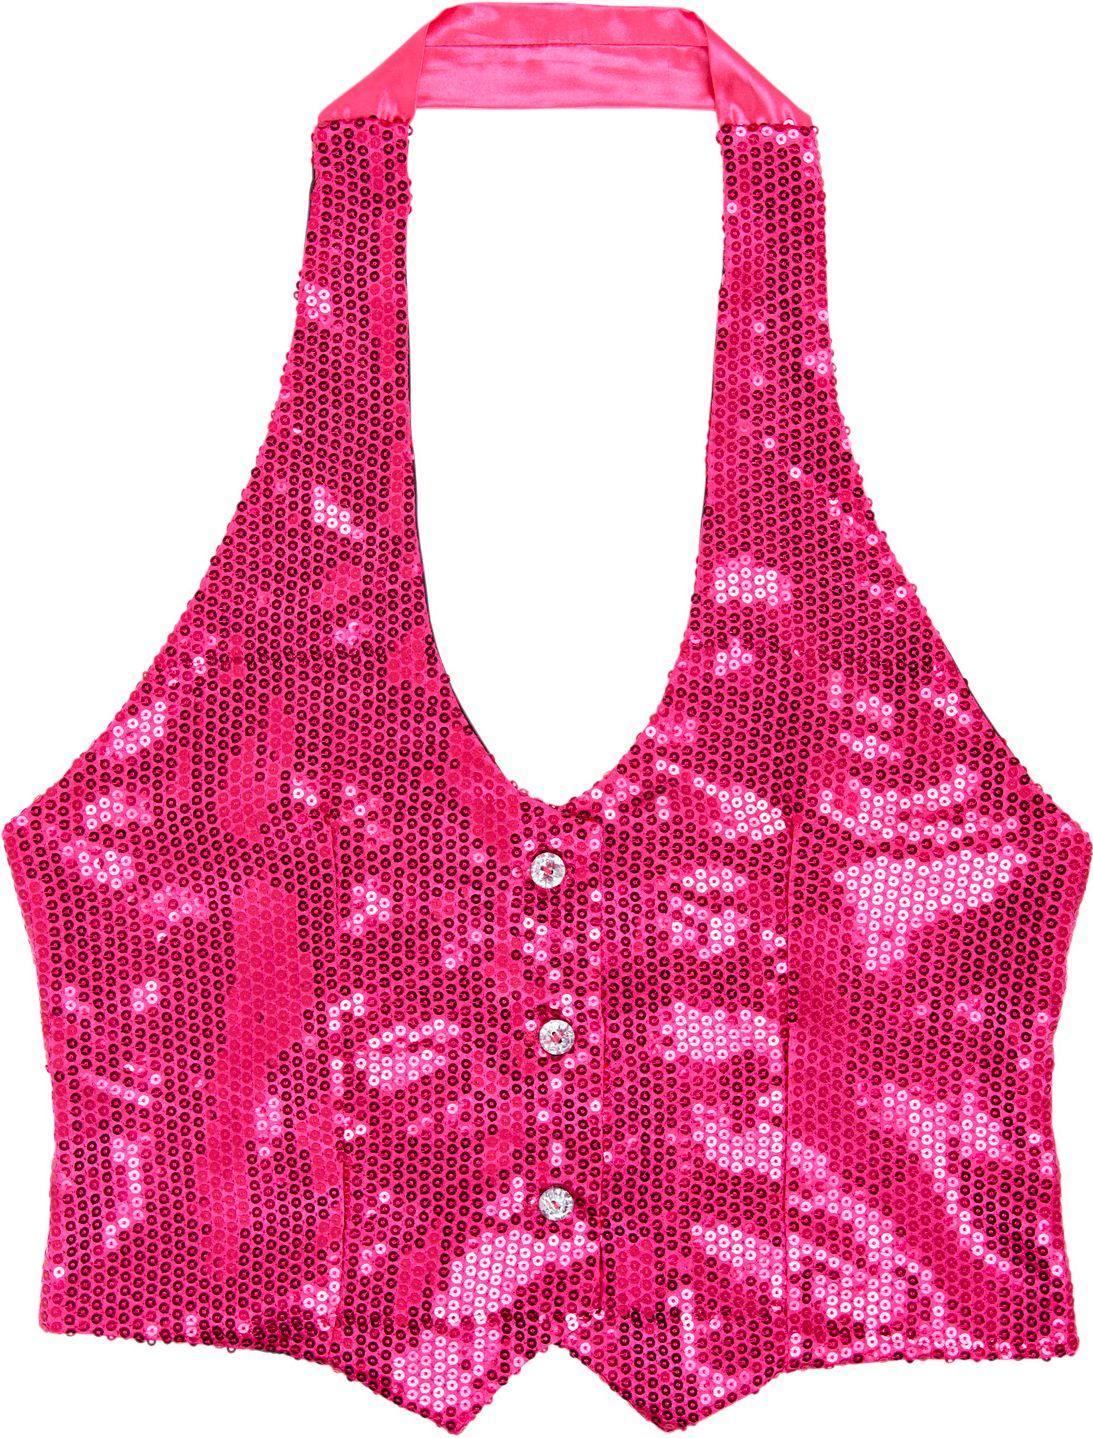 Beste Glitter top roze - Feestkleding.nl NZ-78